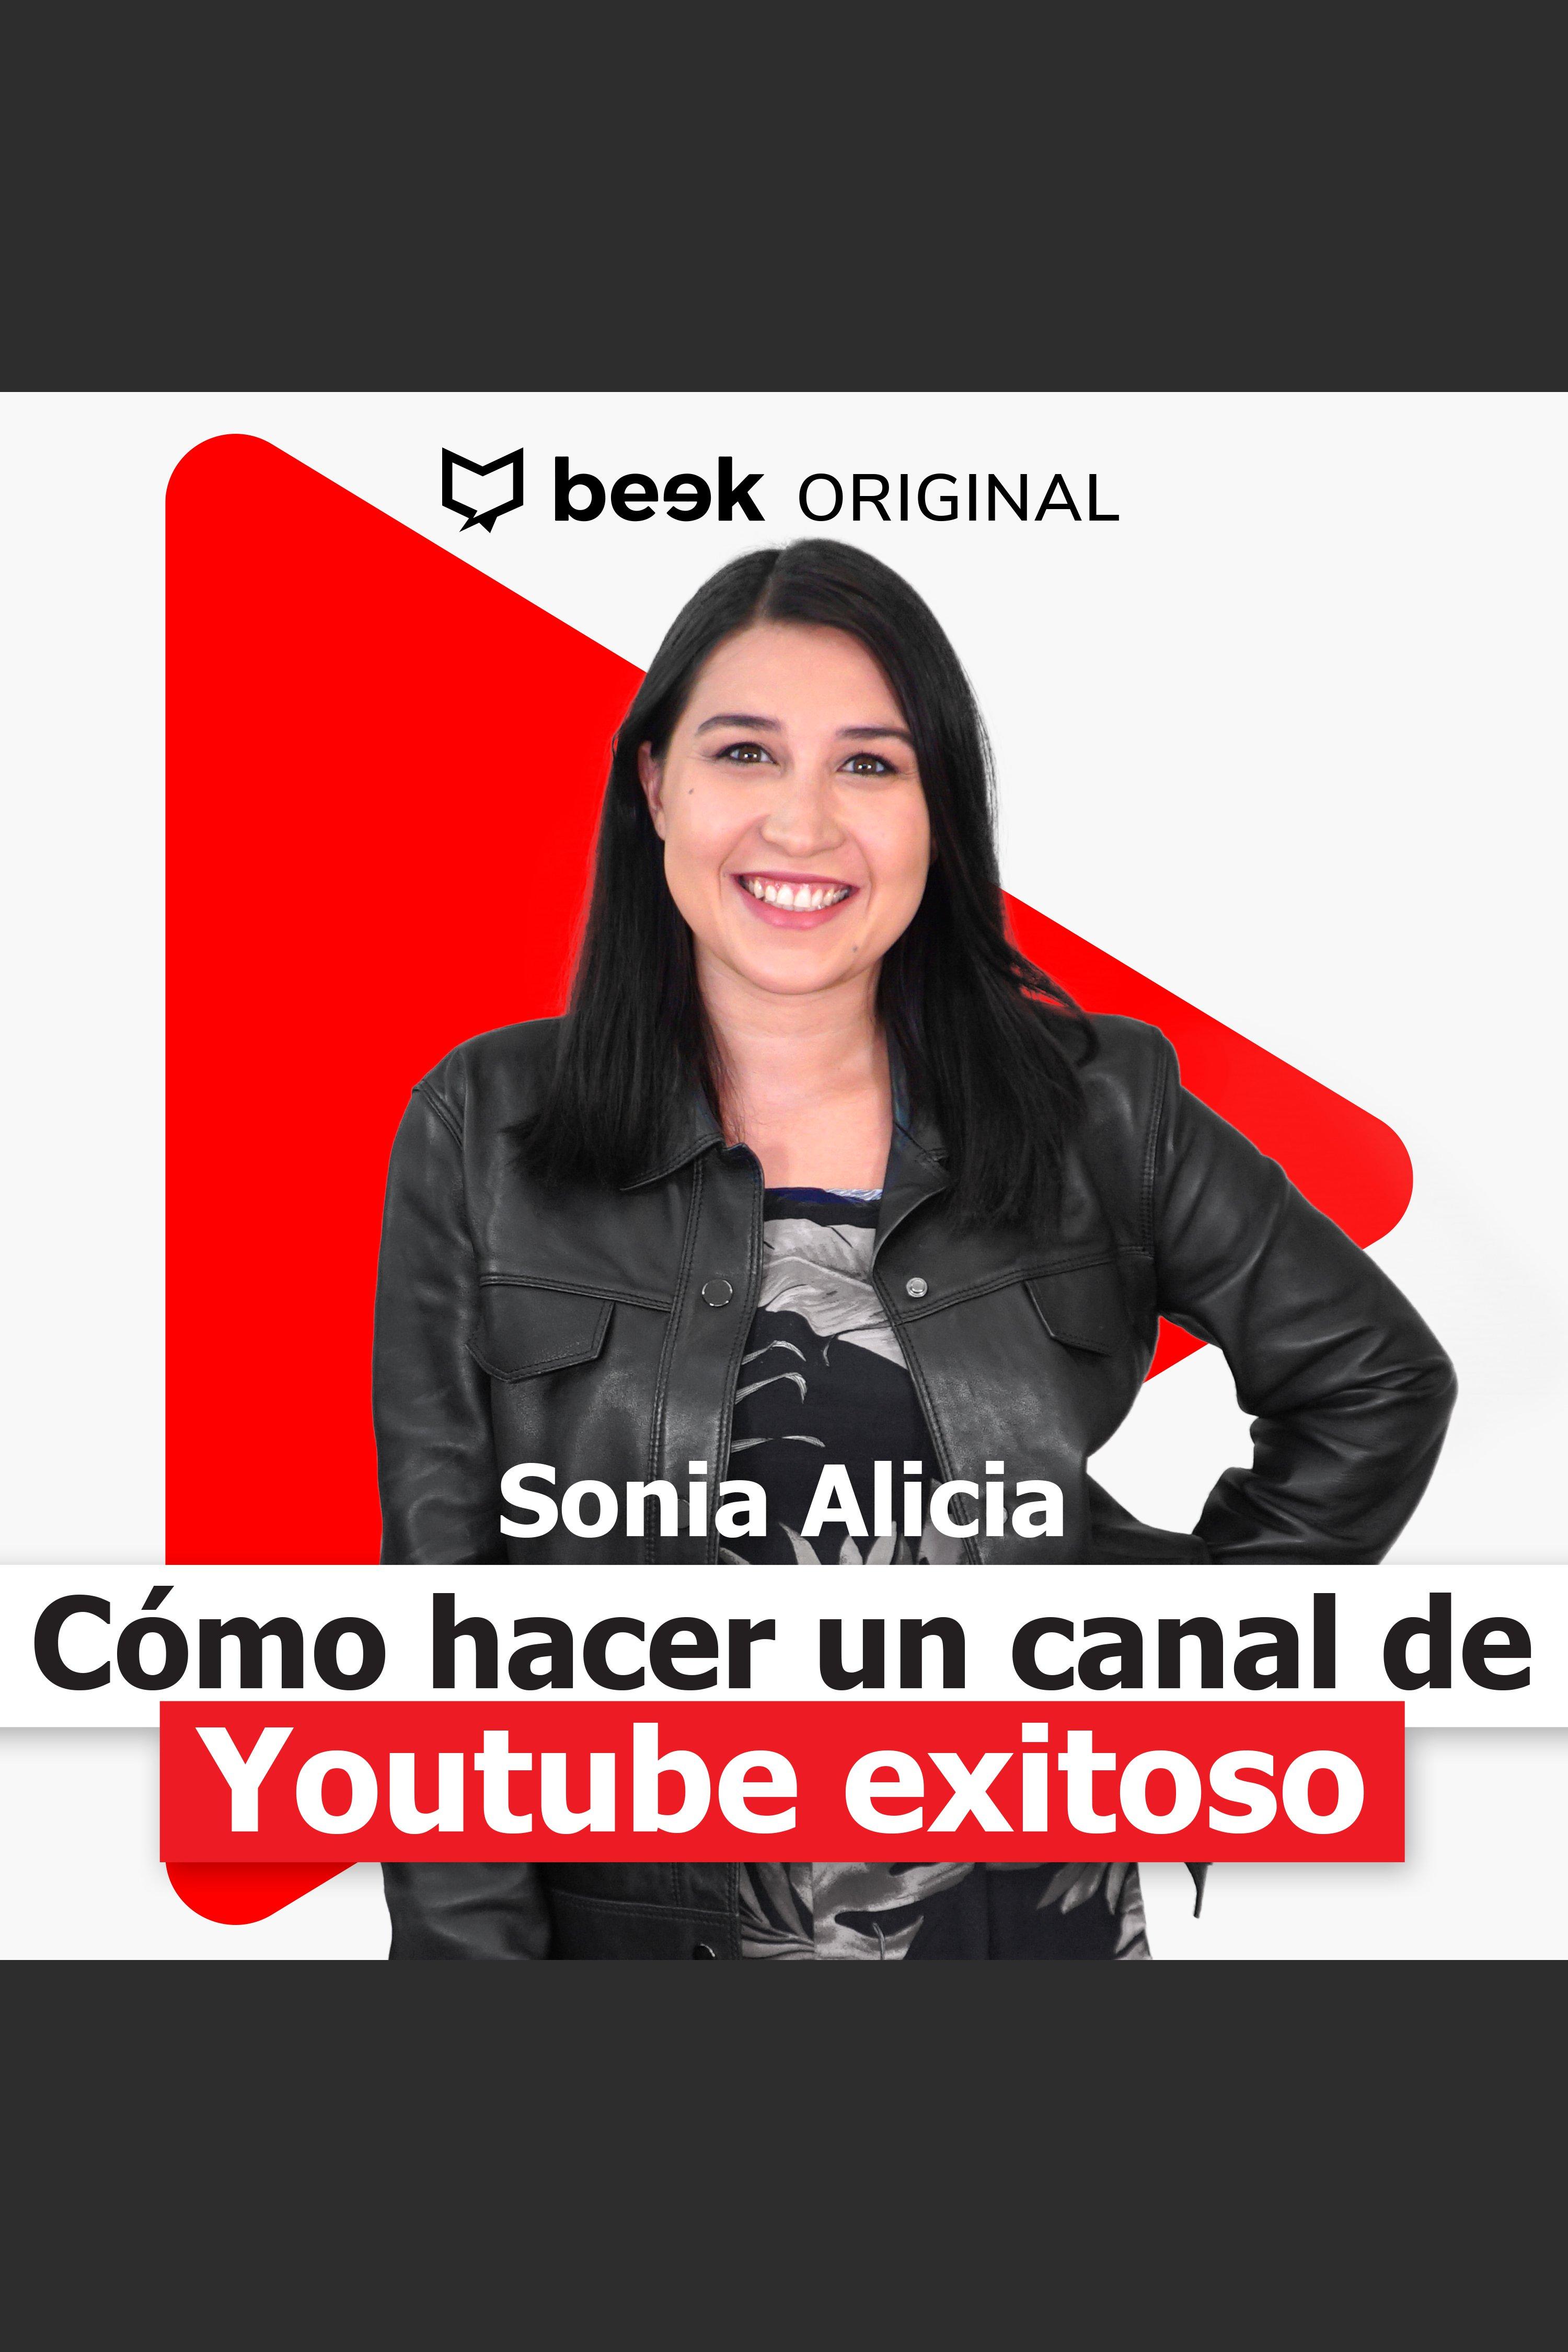 Beek image